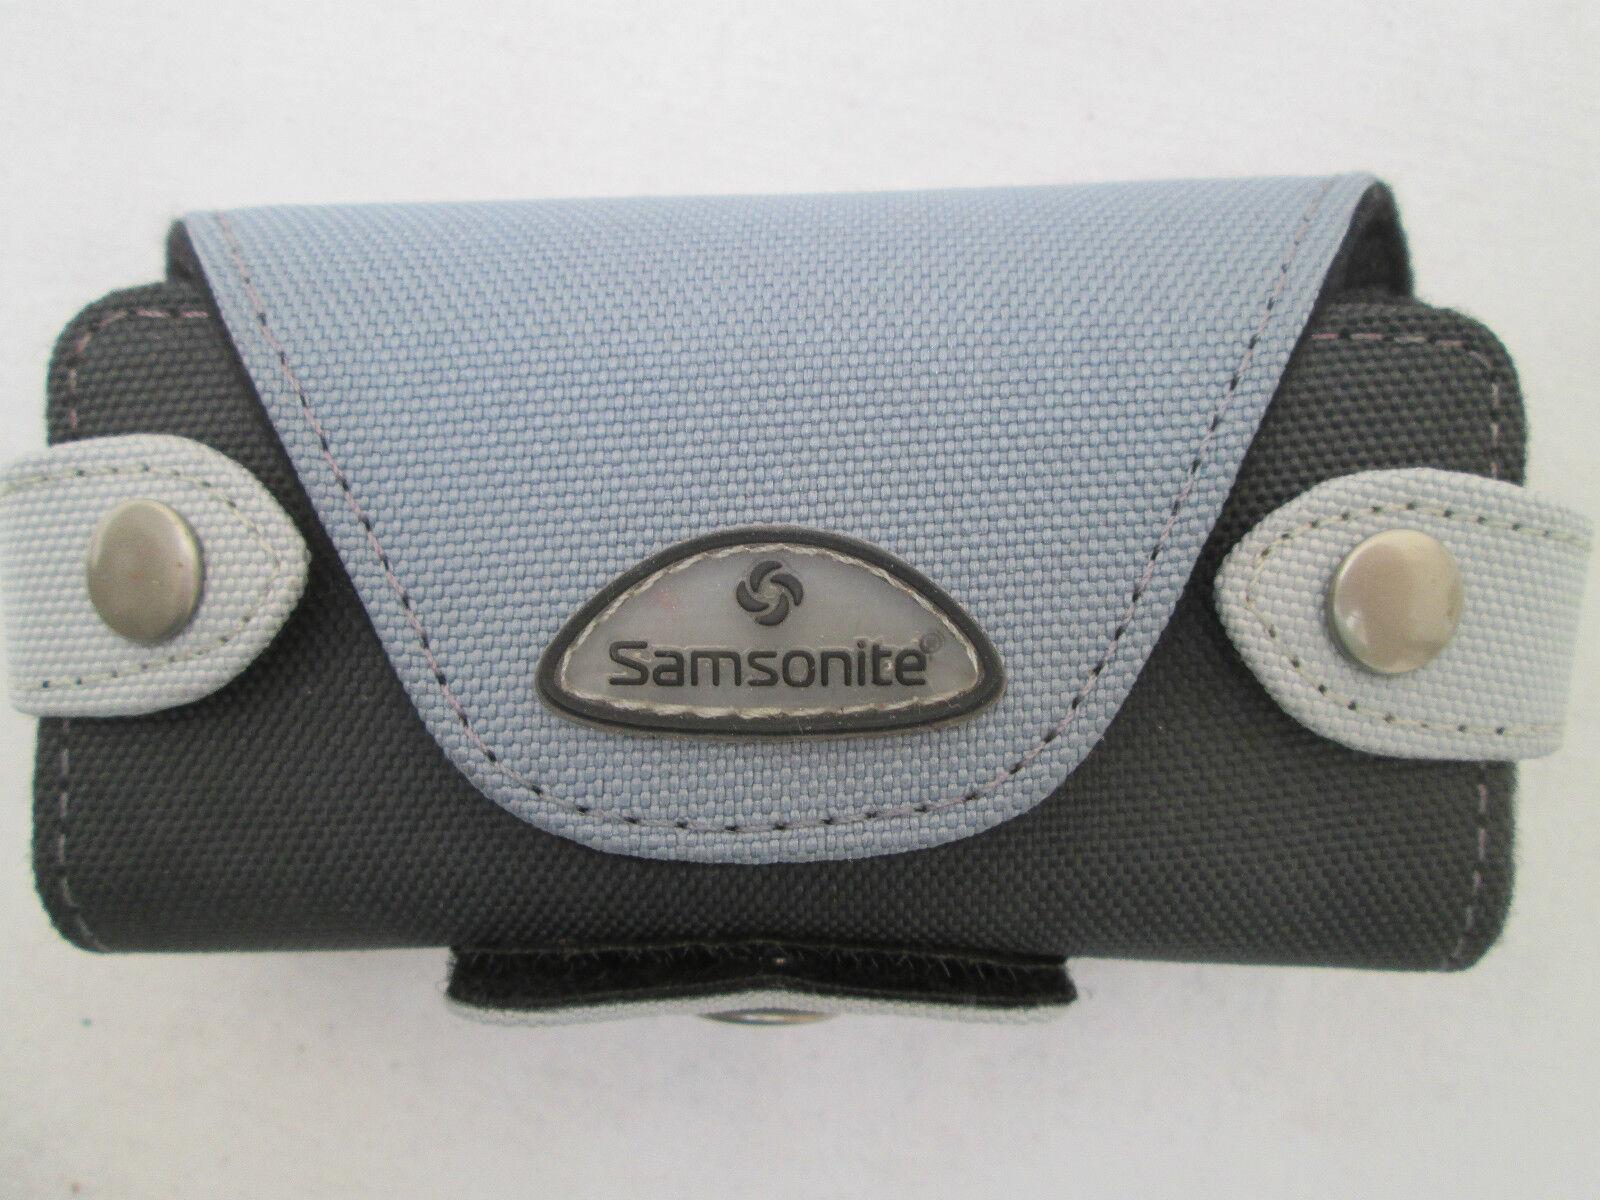 - lucchese pouch portablee samsonite tbeg vintage